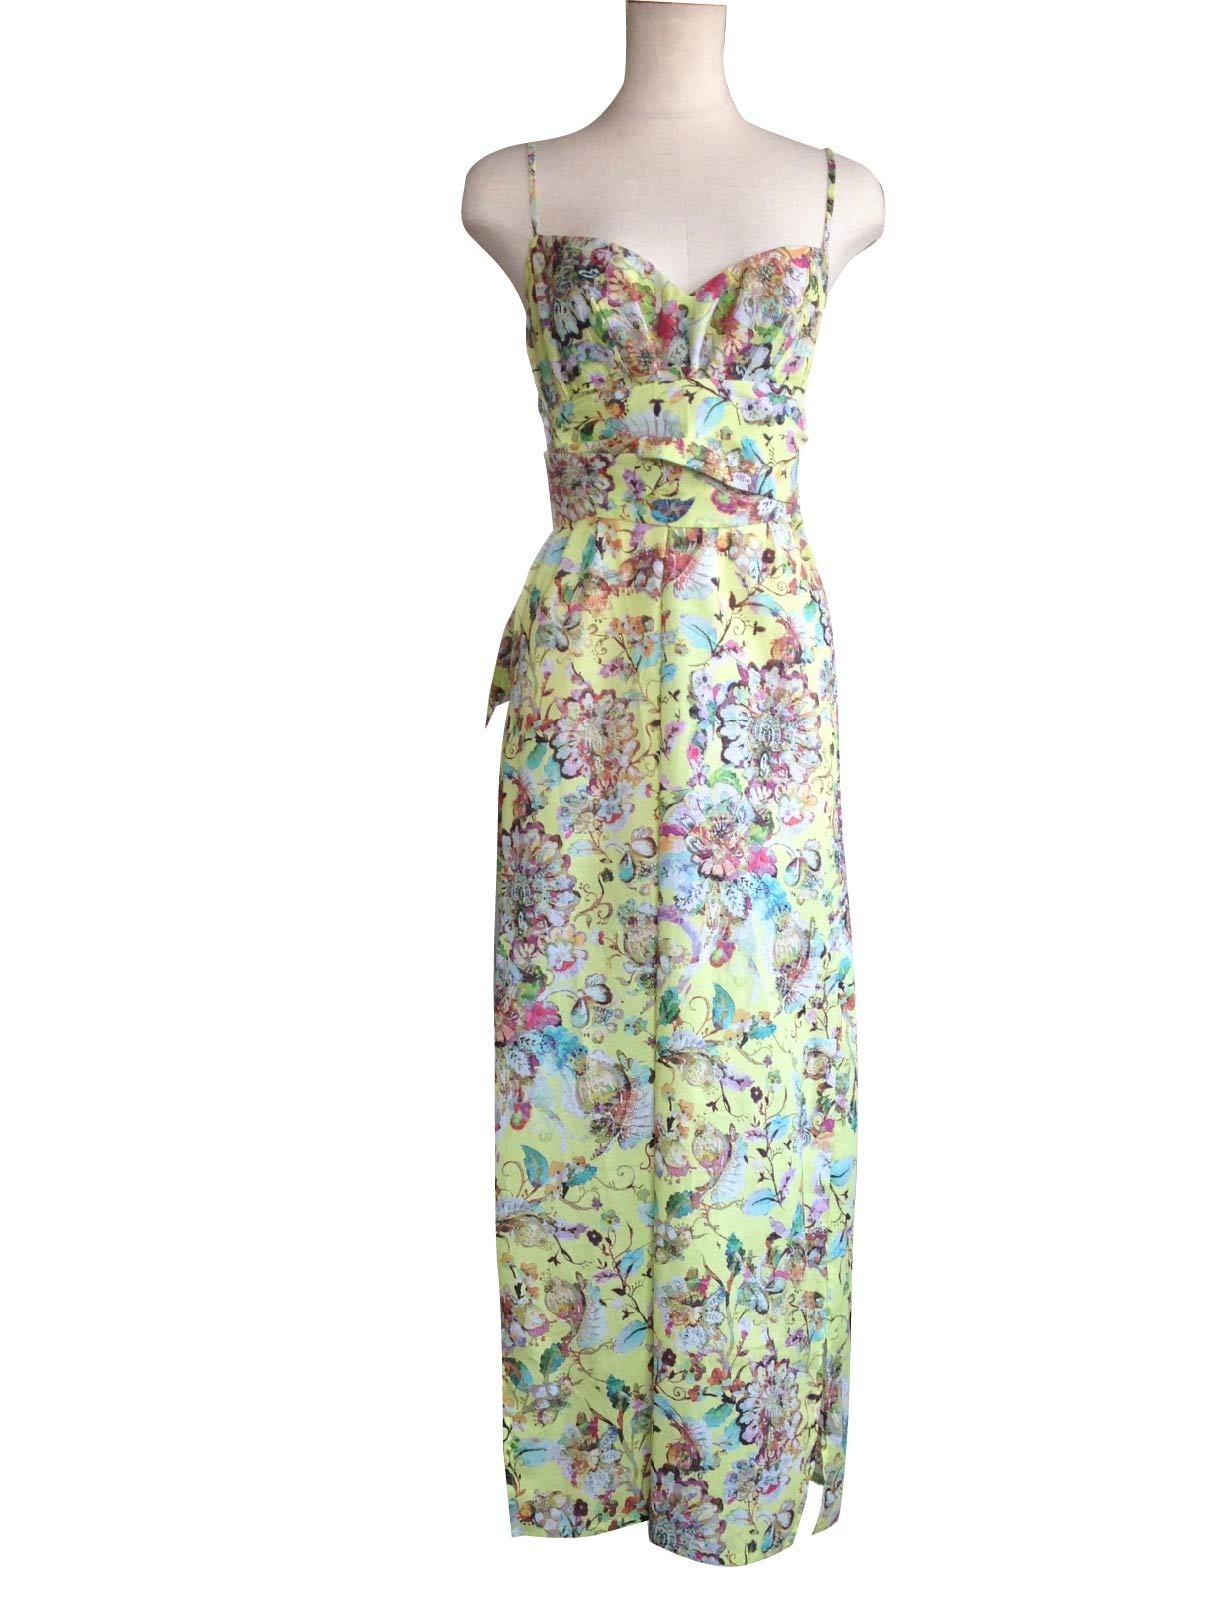 3Ways Maxi Dress Botanical Yellow マキシドレスボタニカルイエロー